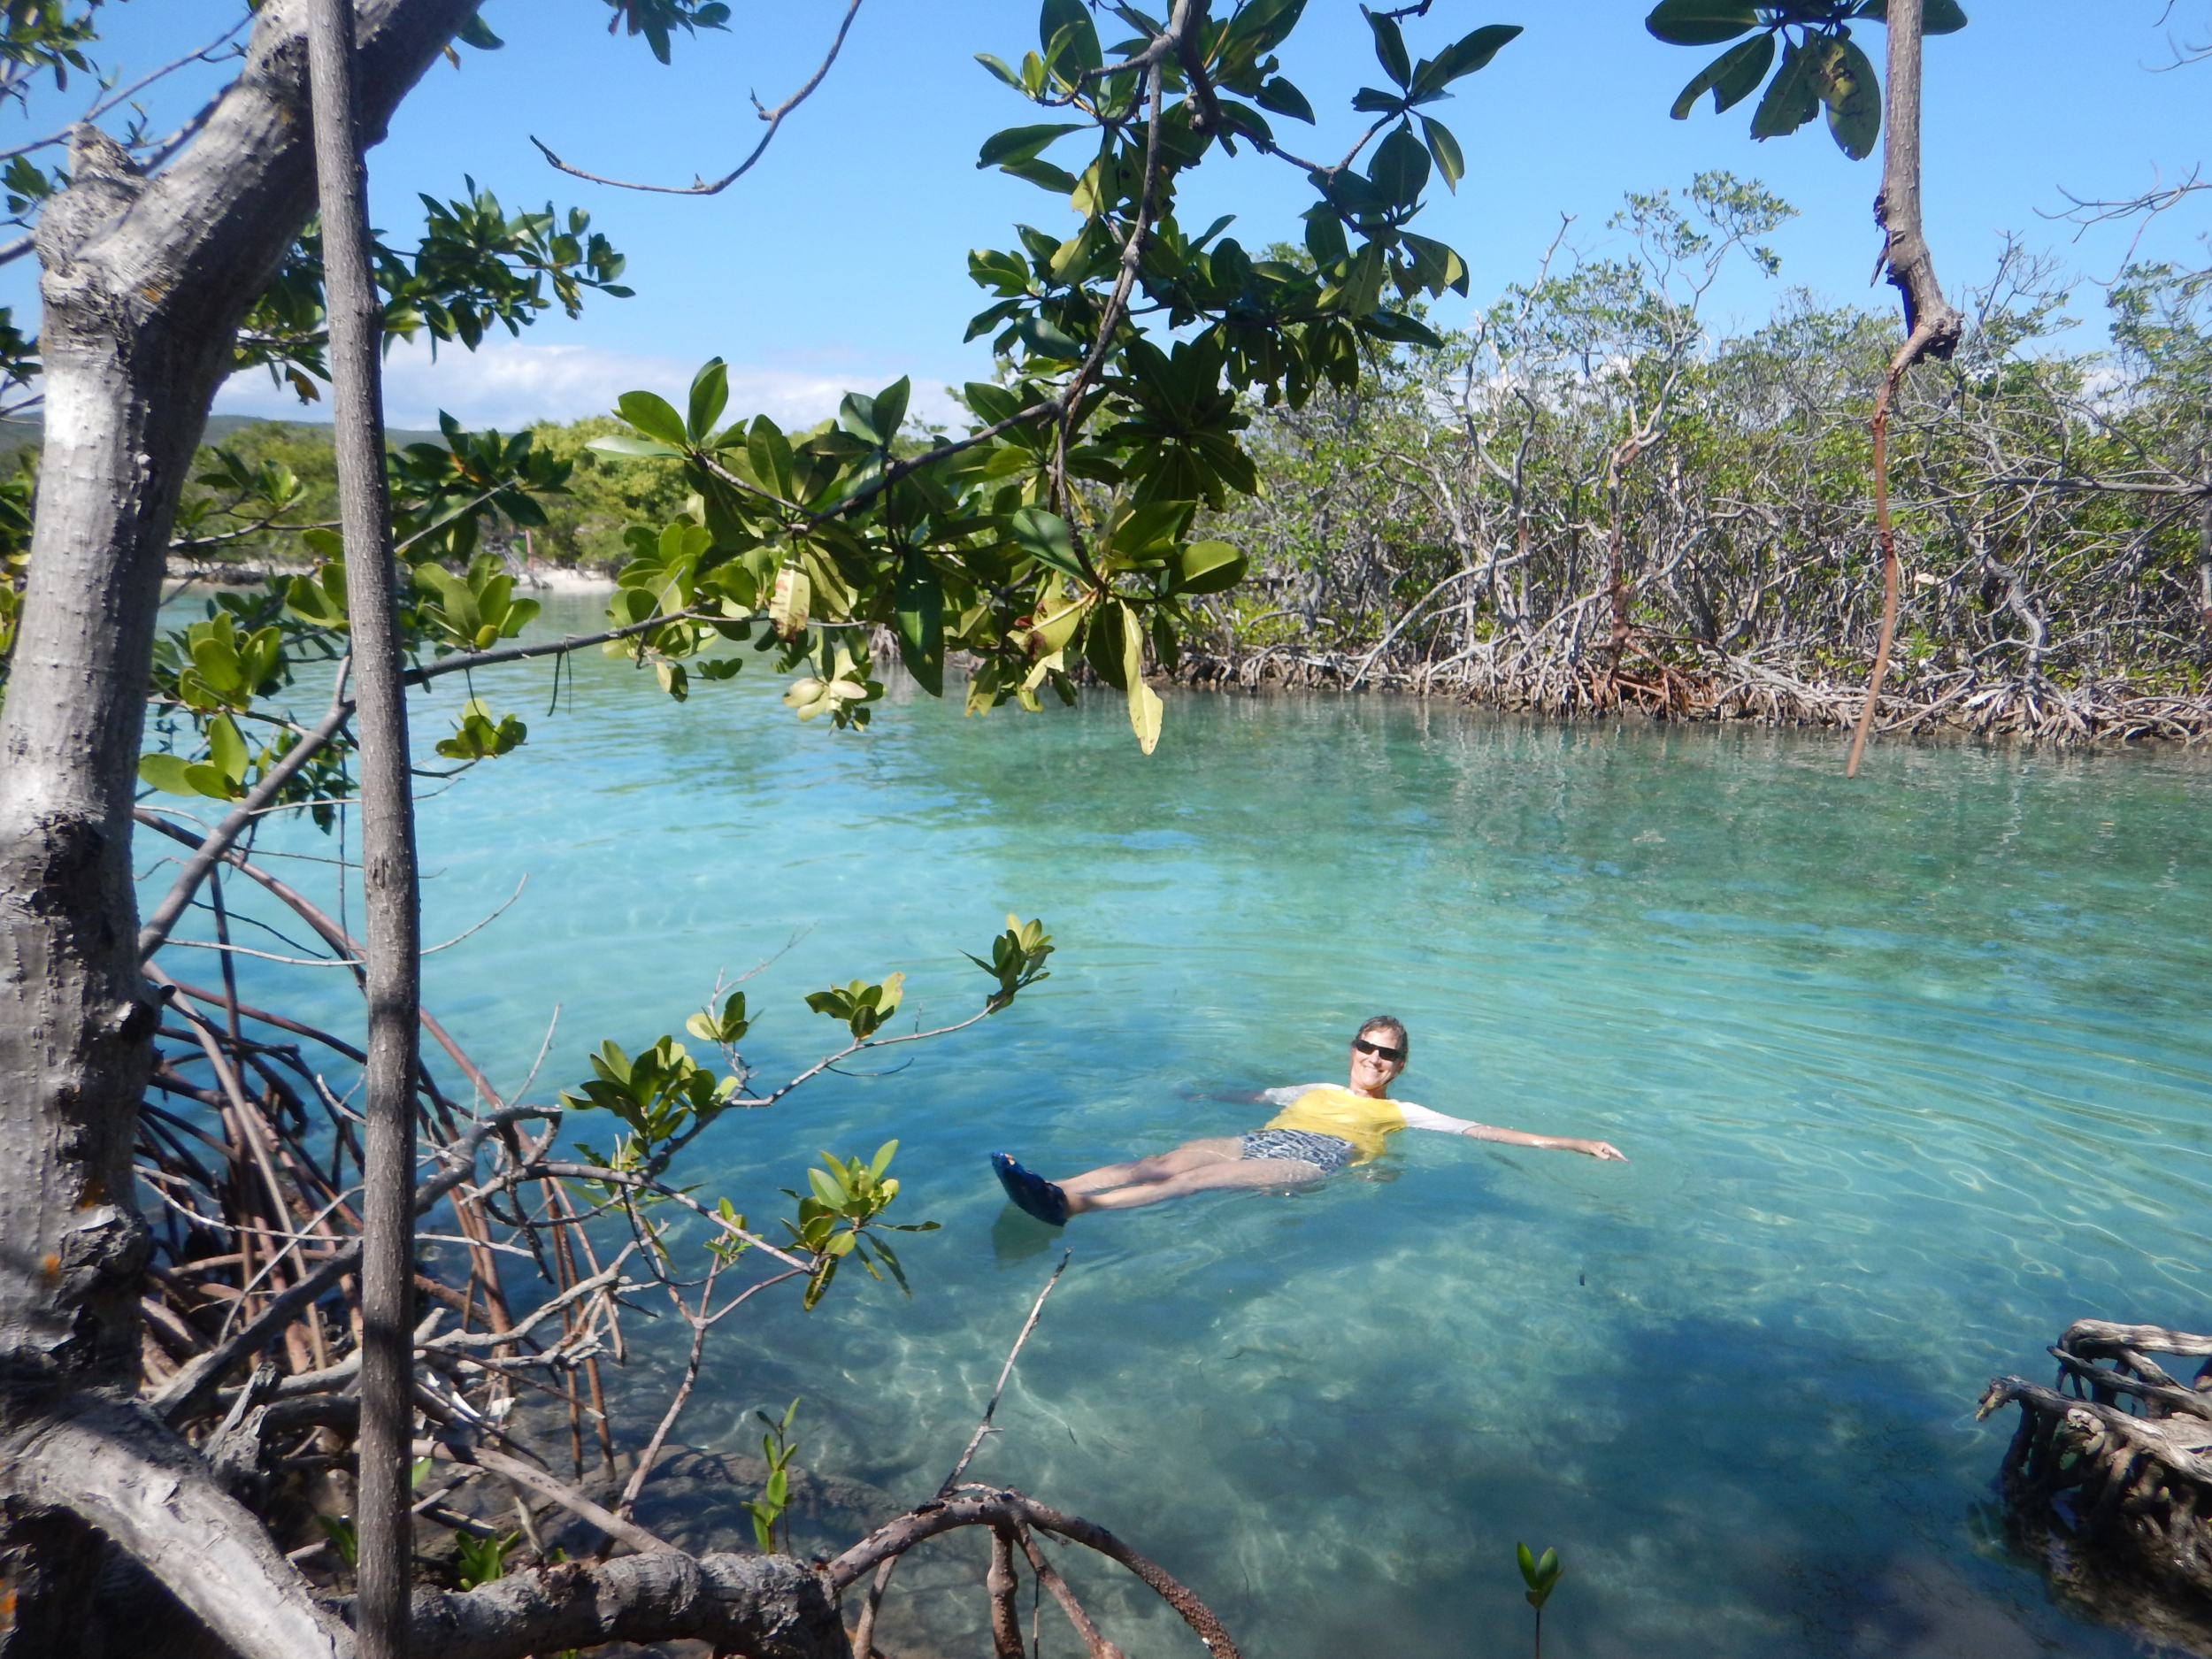 44. Swimming near Gilligans Island